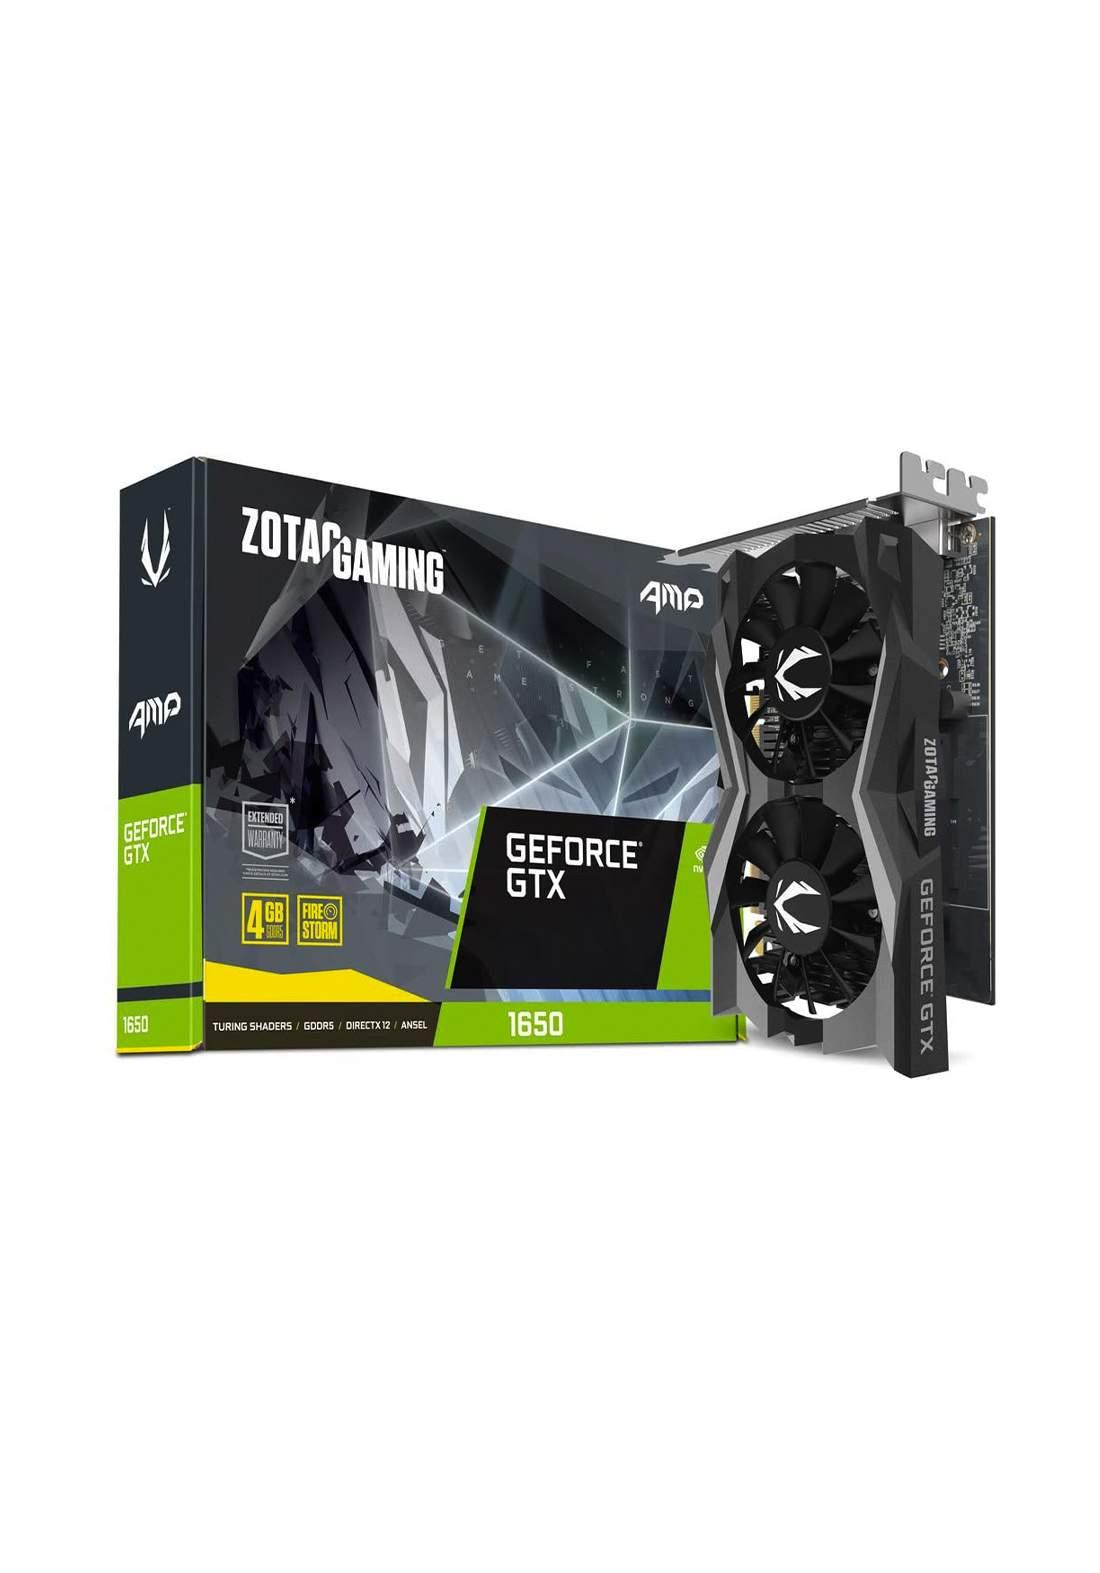 Zotac Gaming Geforce GTX 1650 AMP Edition 4GB GDDR5